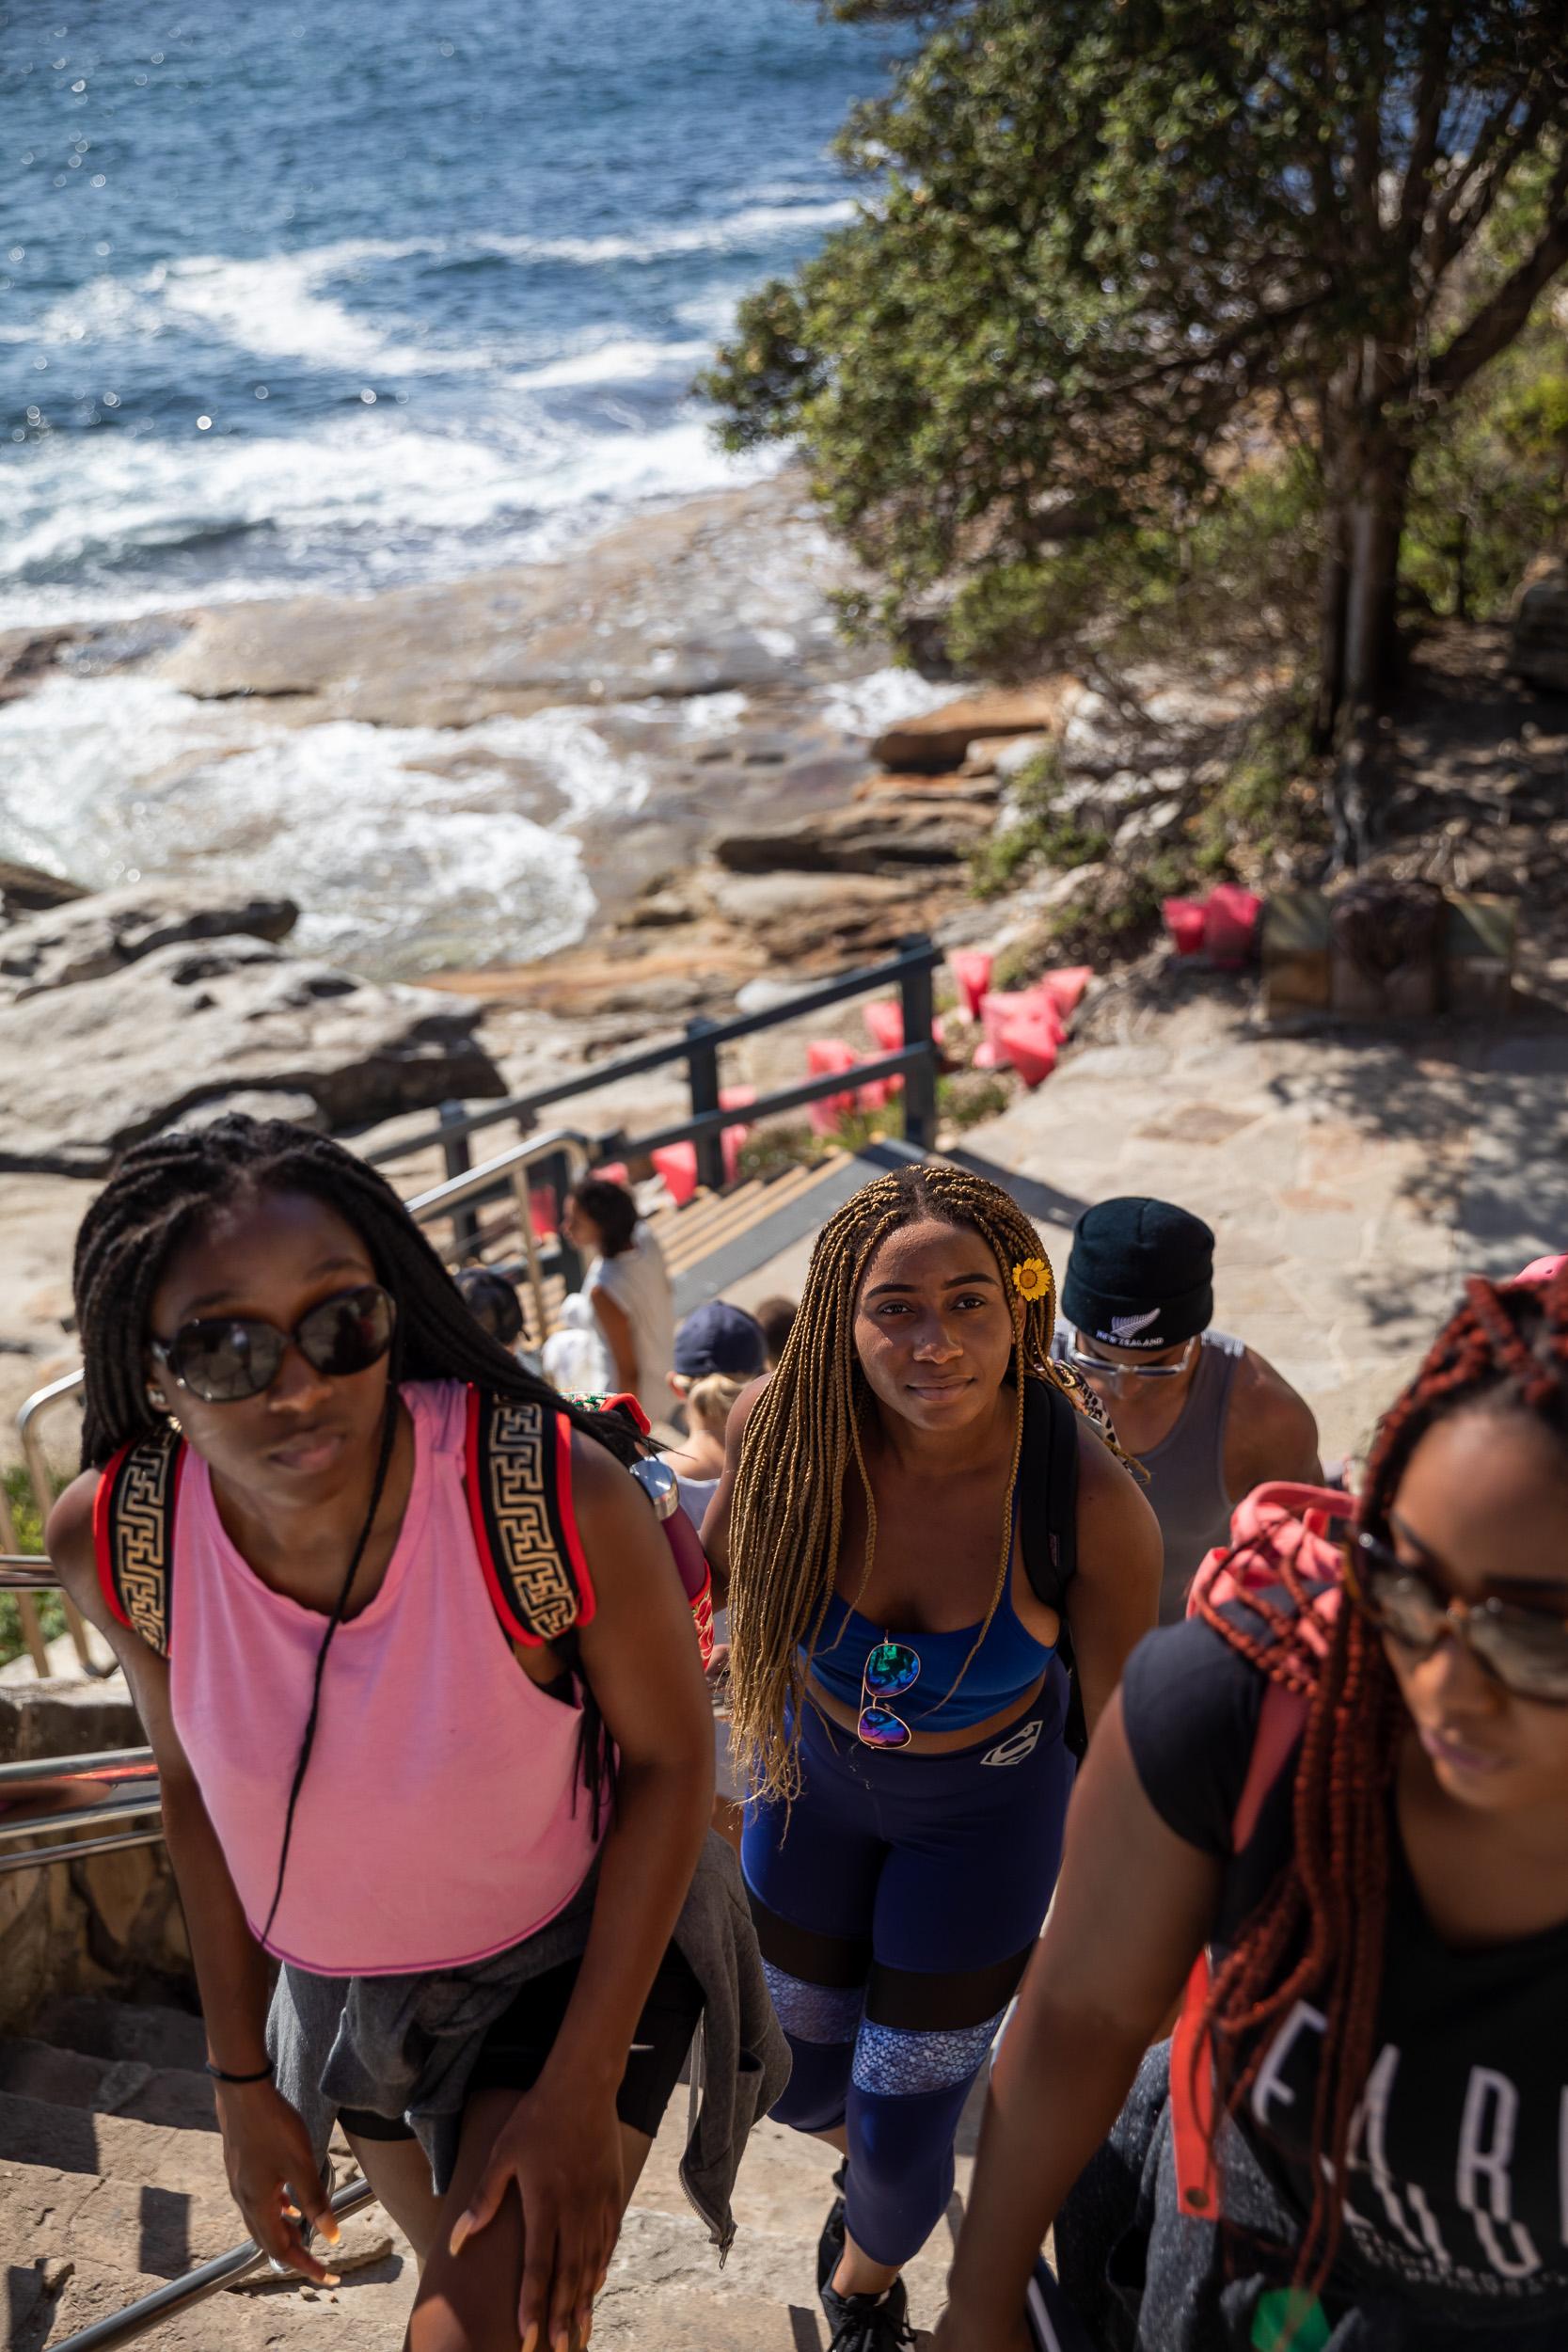 Freestyle - Bondi to Bronte coastal walk - NYU Sydney 2018